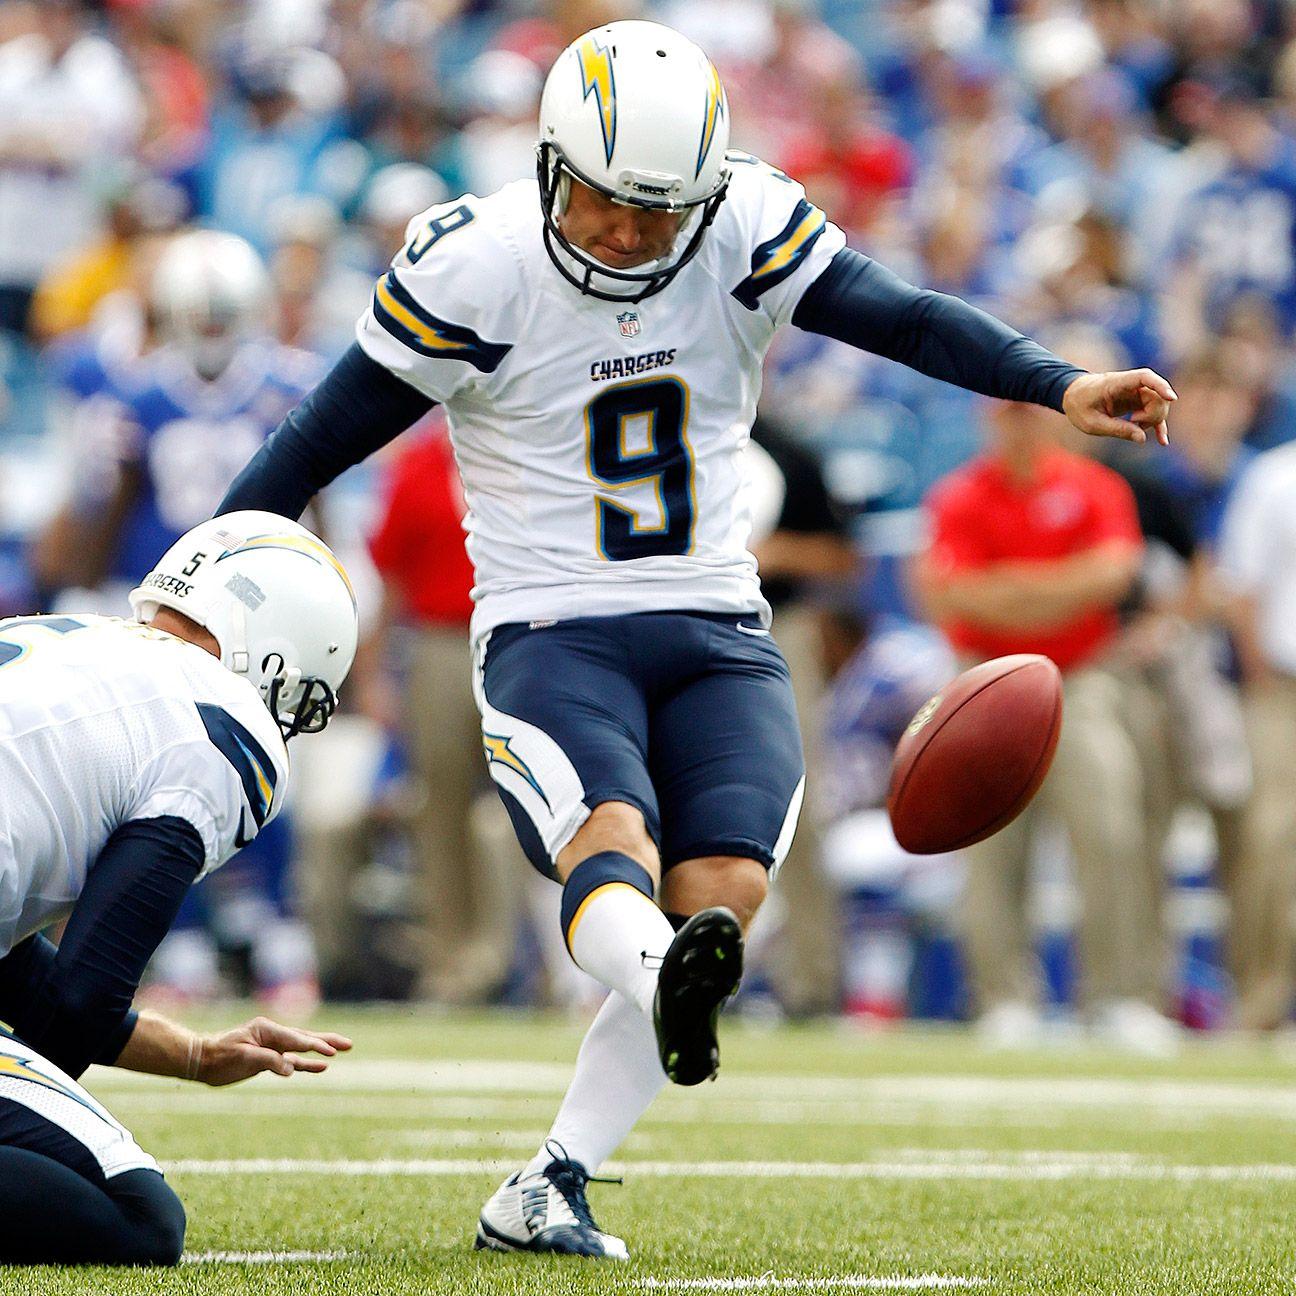 Nick Novak relishes competition for Chargers' kicking job